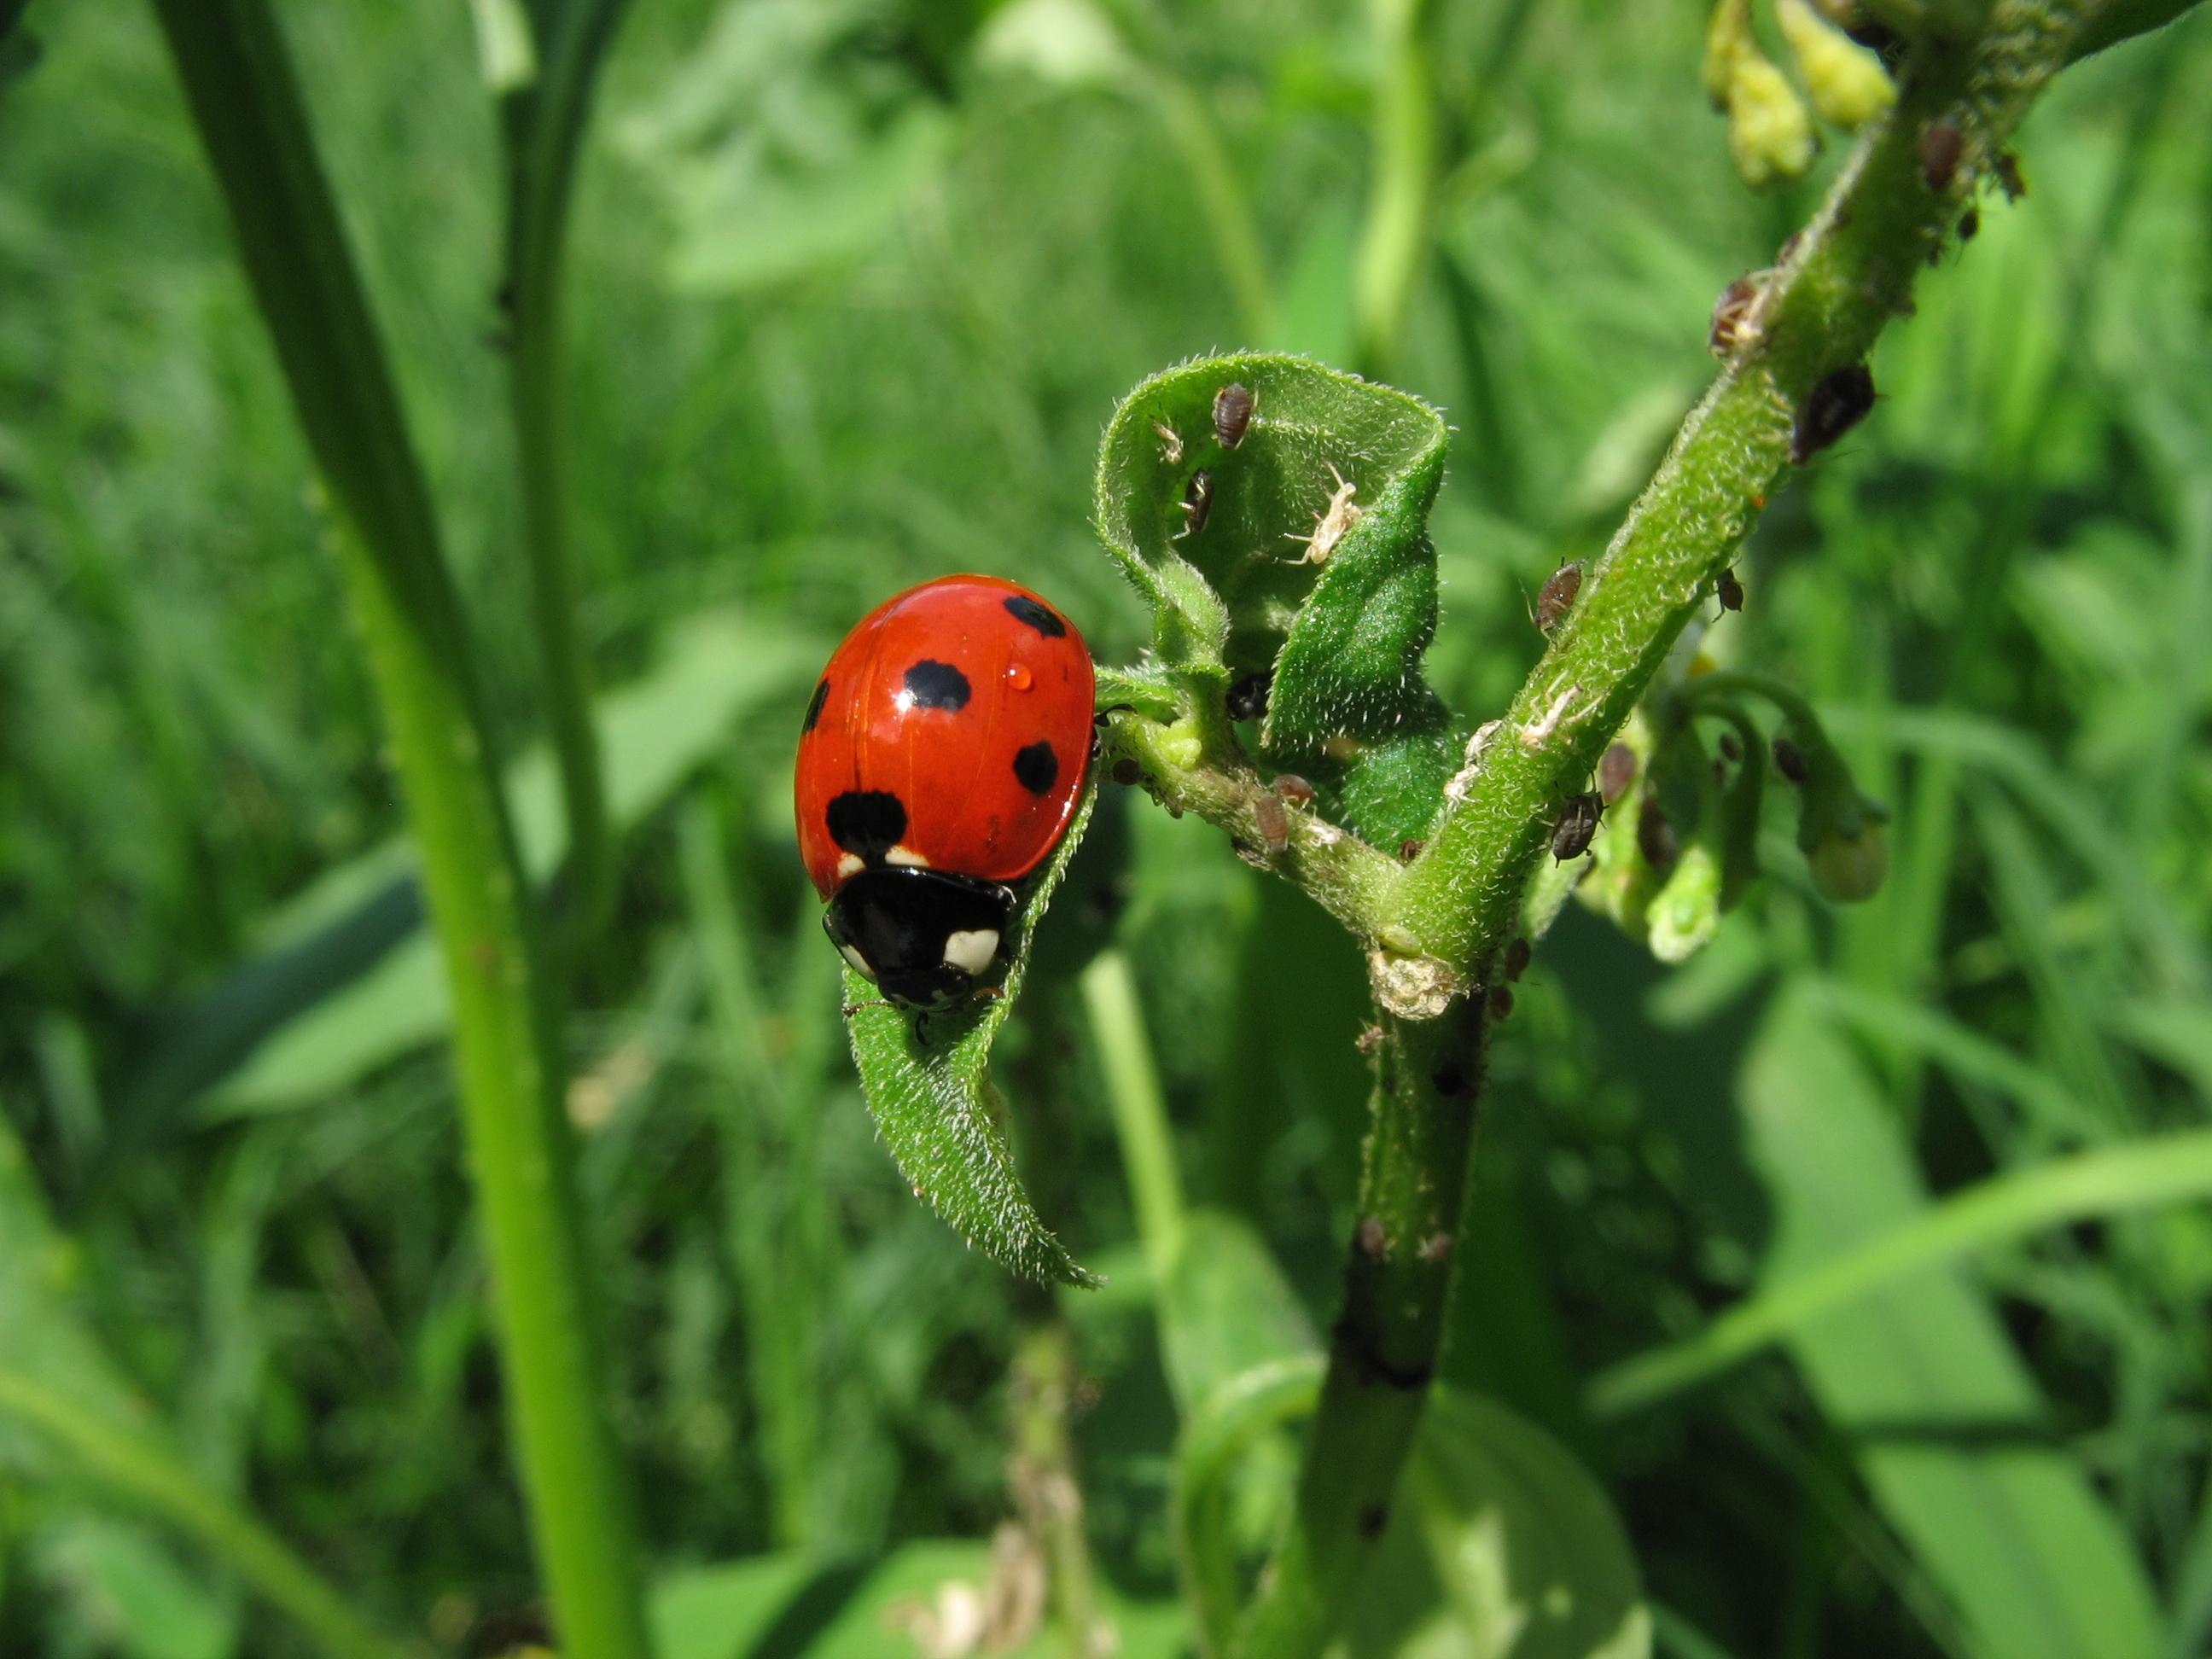 File:Ladybug aphids.JPG - Wikimedia Commons